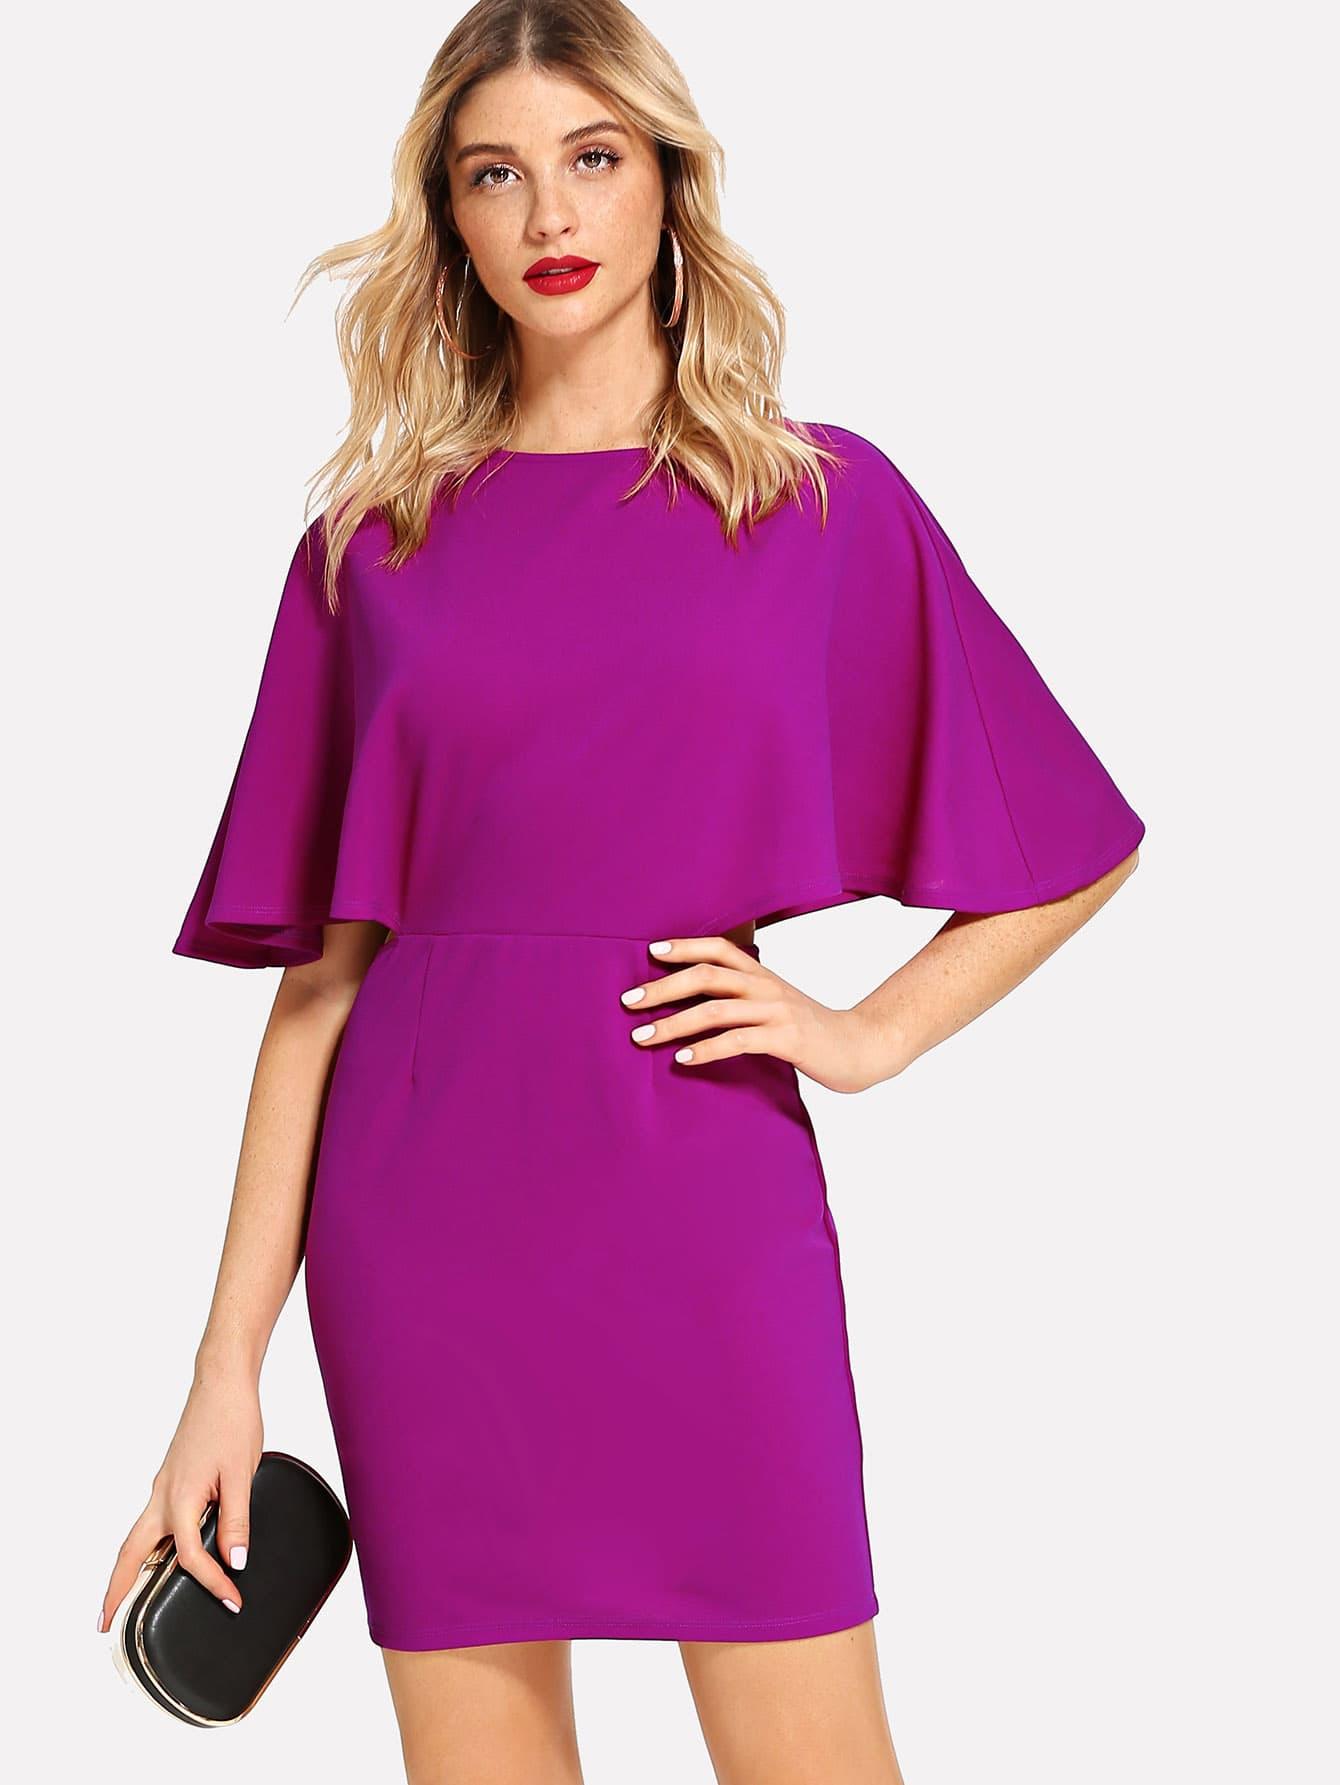 Купить V Cut Out Back Batwing Sleeve Dress, Nathane, SheIn